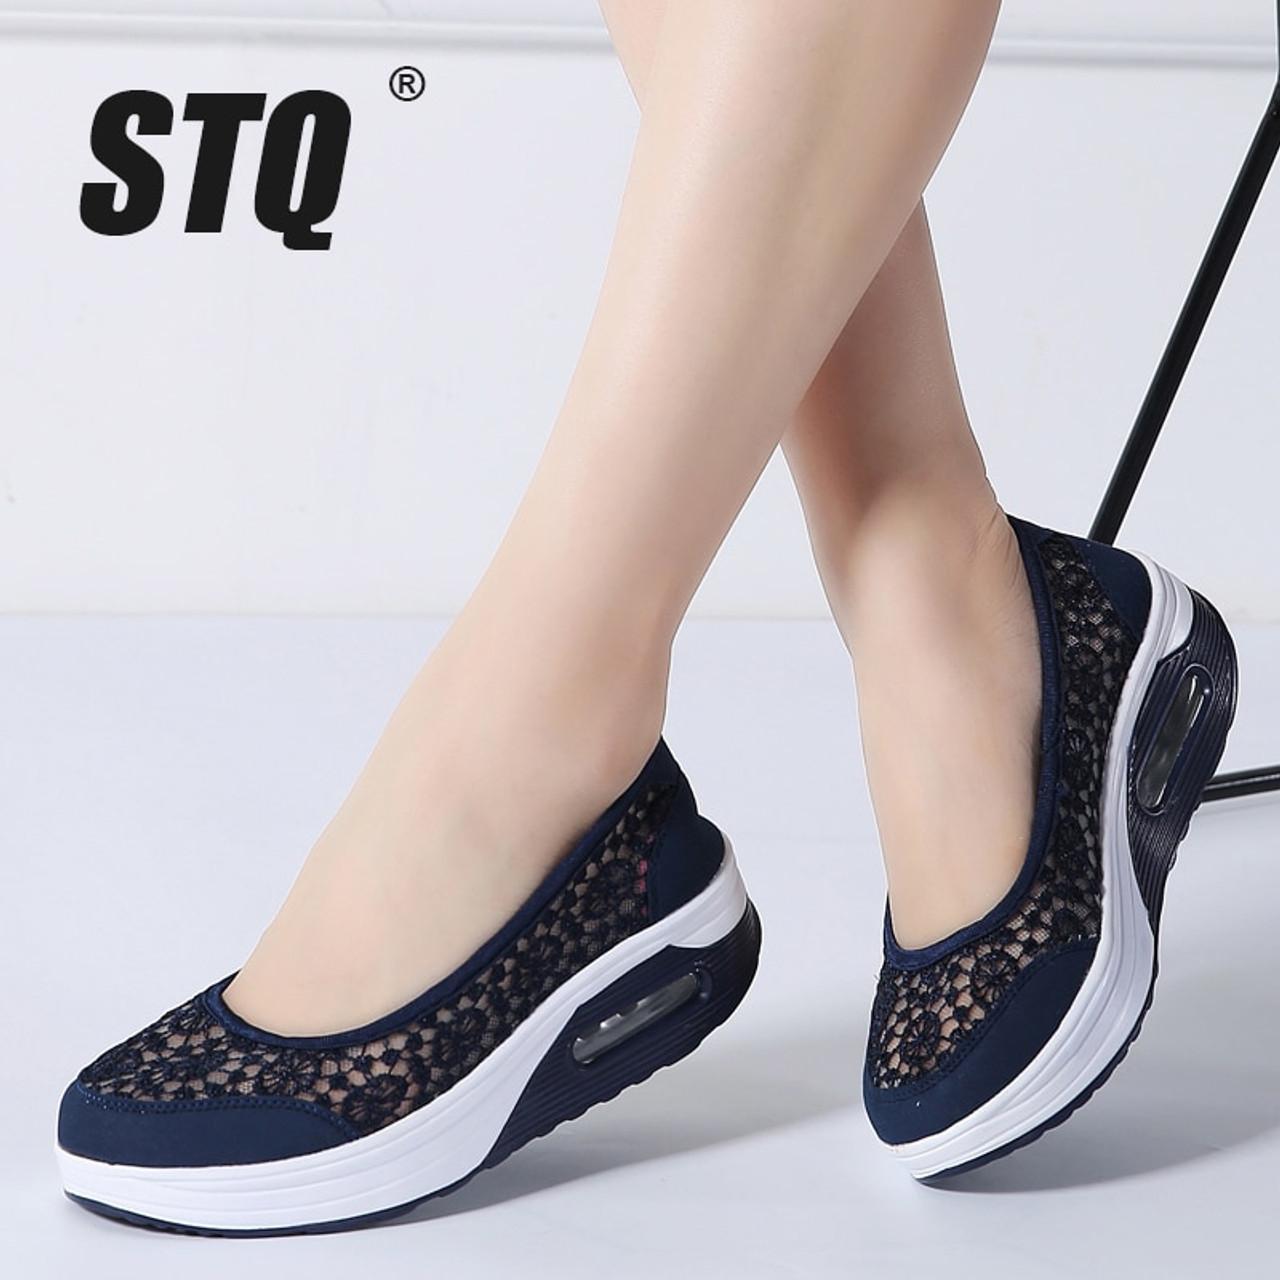 d19cd8b57054a STQ 2019 Summer women flat platform shoes women breathable mesh casual  sneakers shoes ladies slip on ...